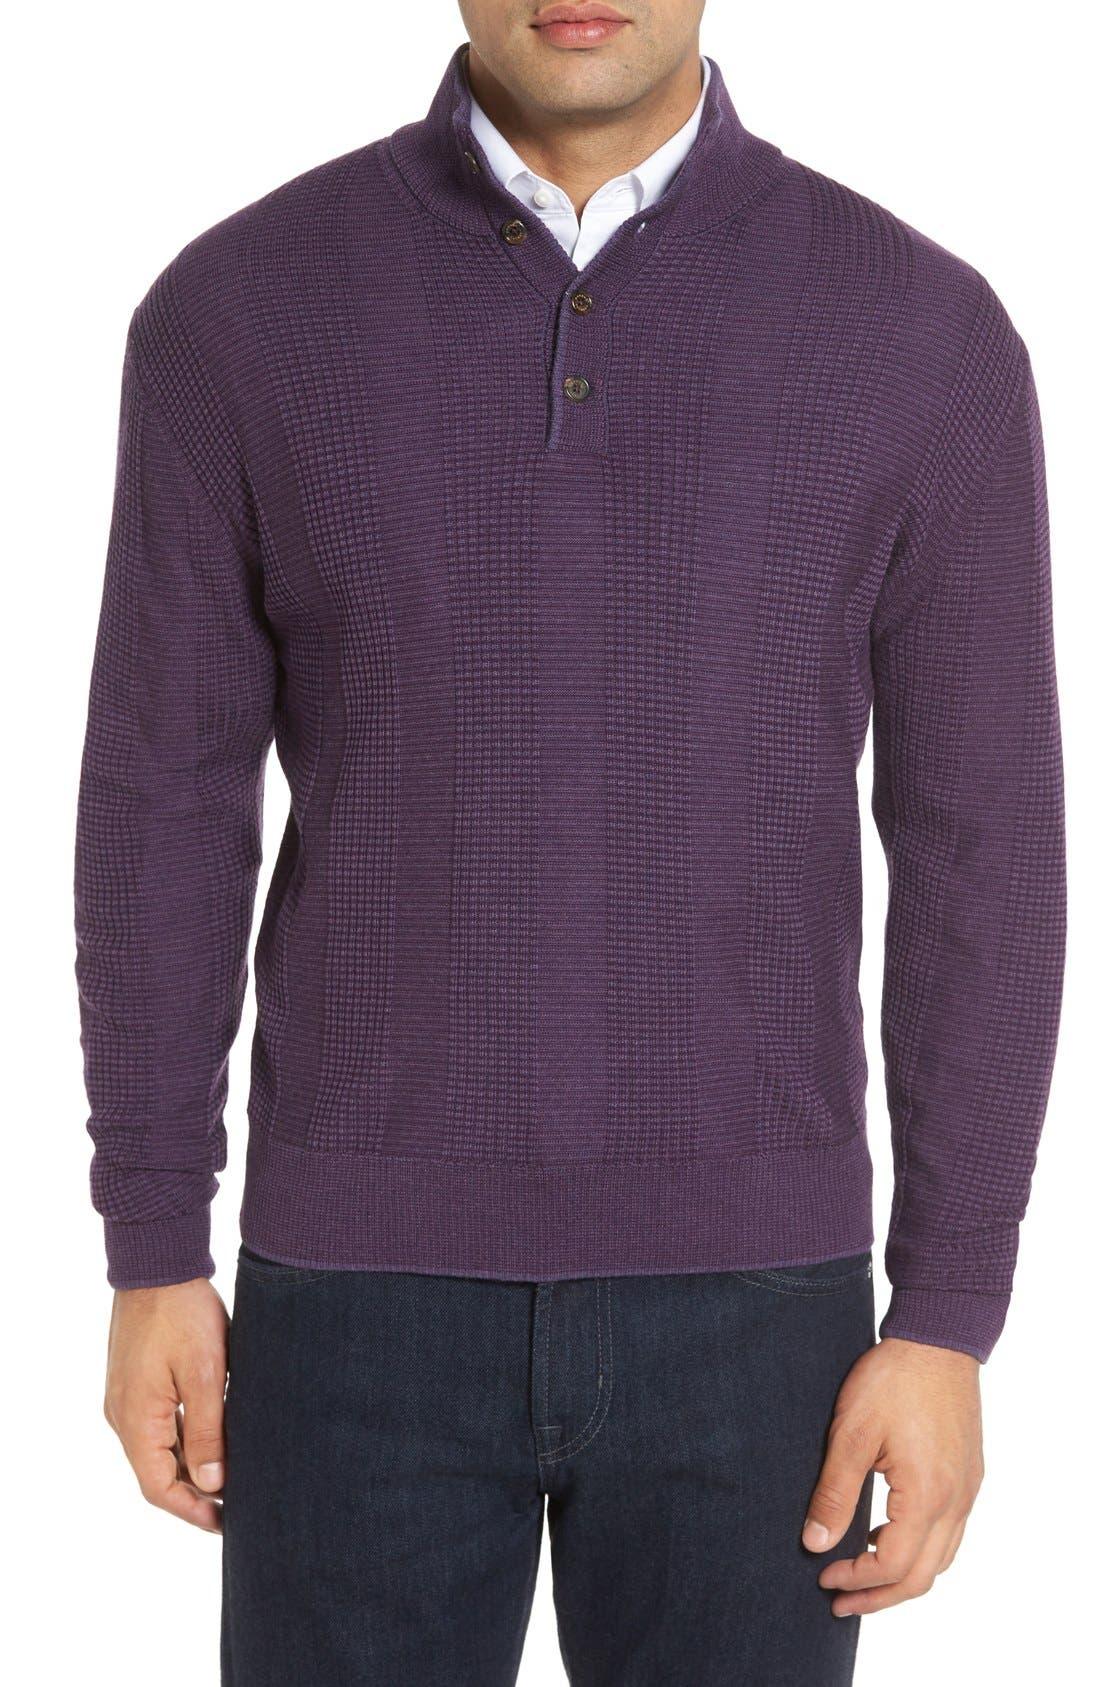 Main Image - Robert Talbott 'Legacy Collection' Mock Neck Wool Sweater